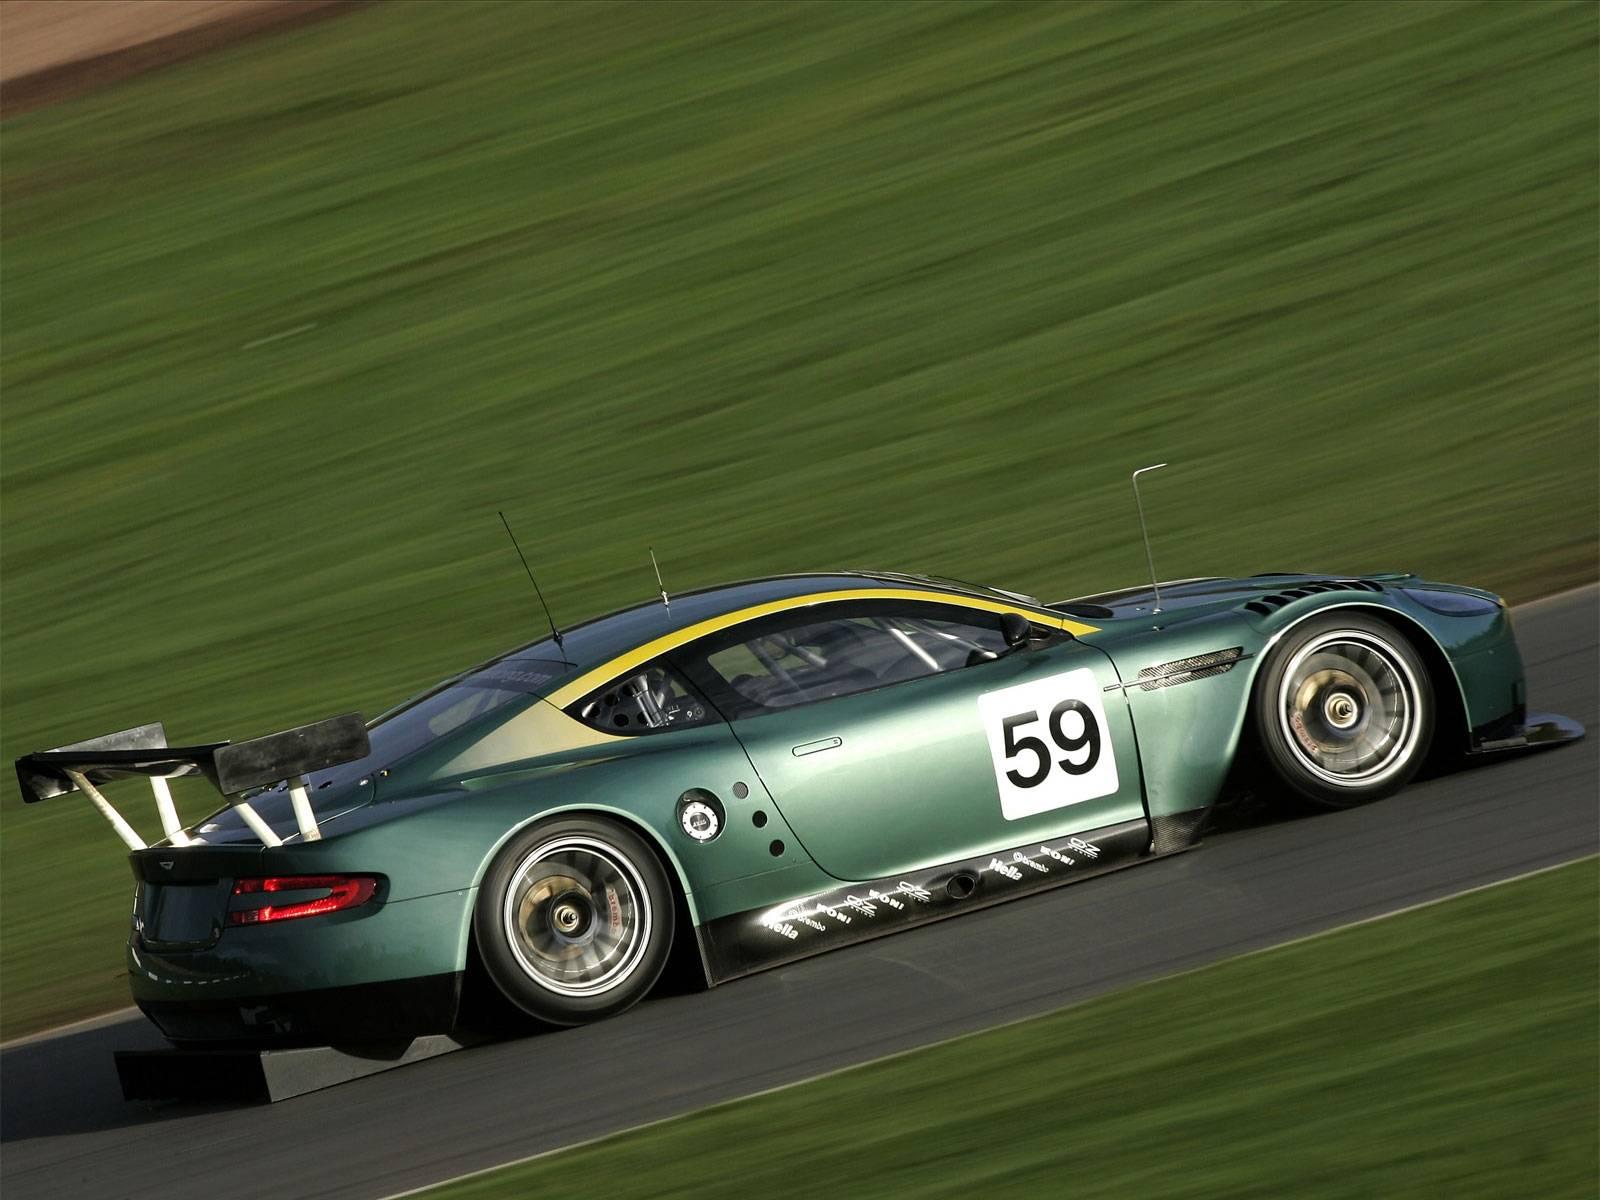 Aston Martin DBR9 Free